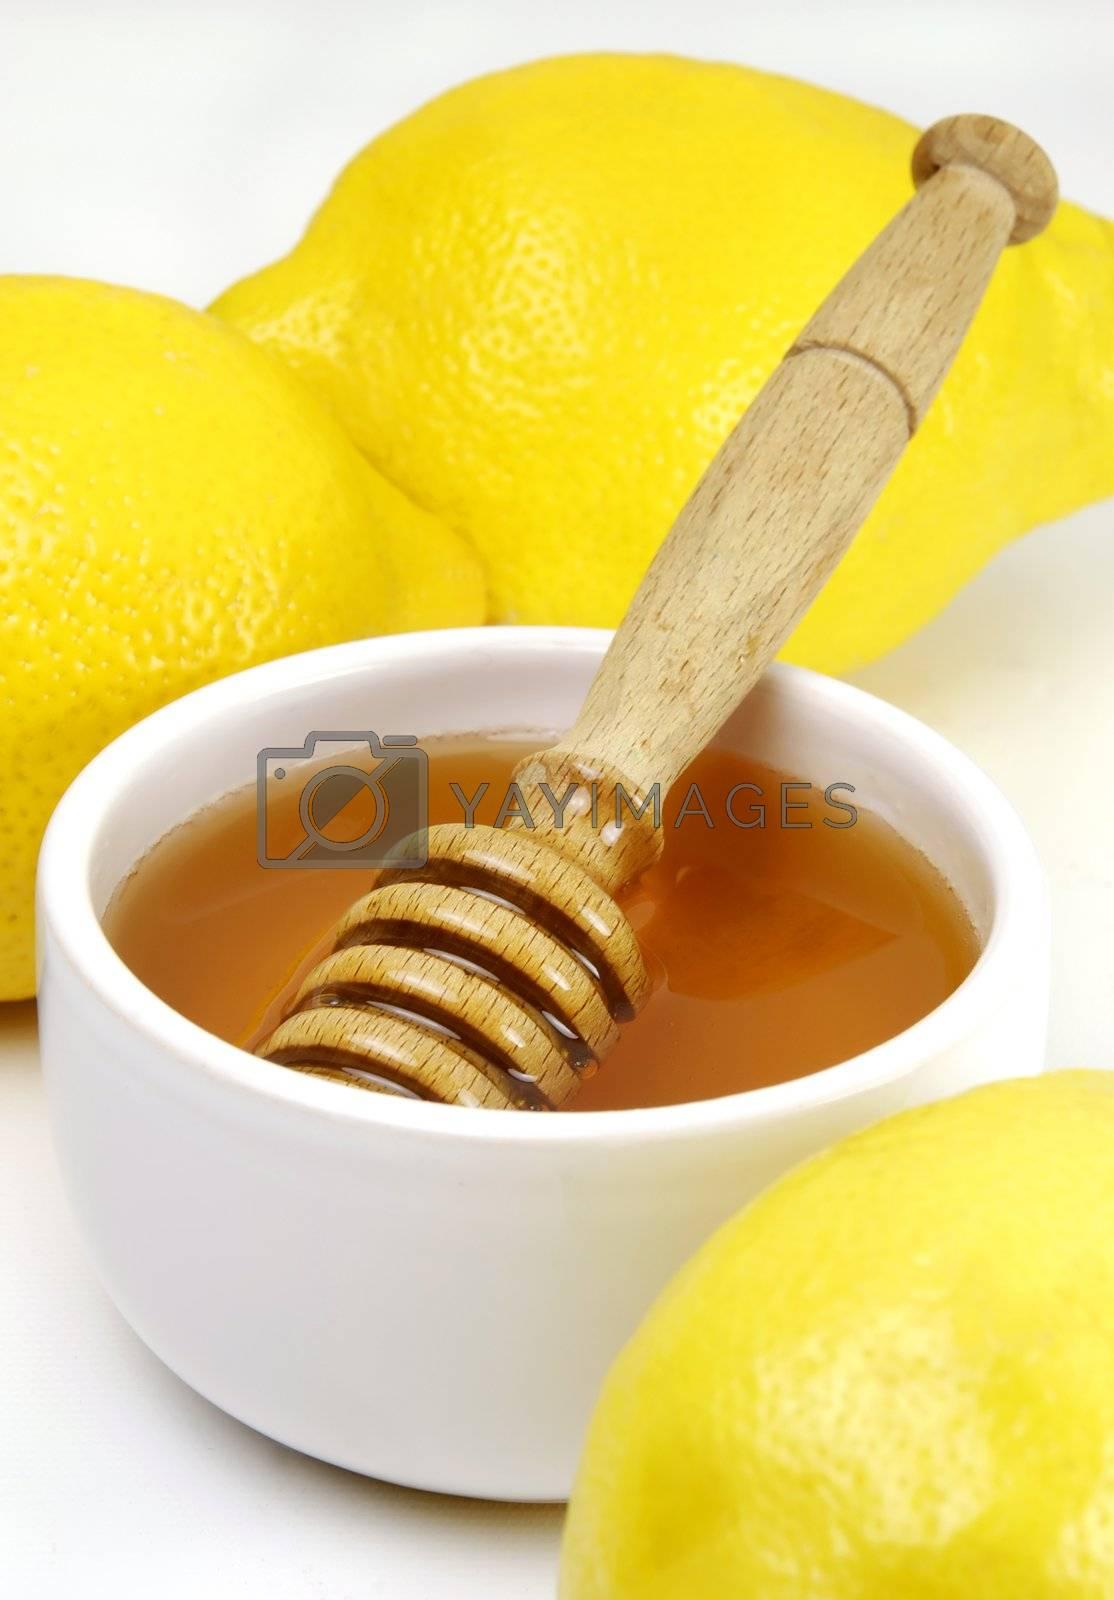 Honey and Lemons by massman